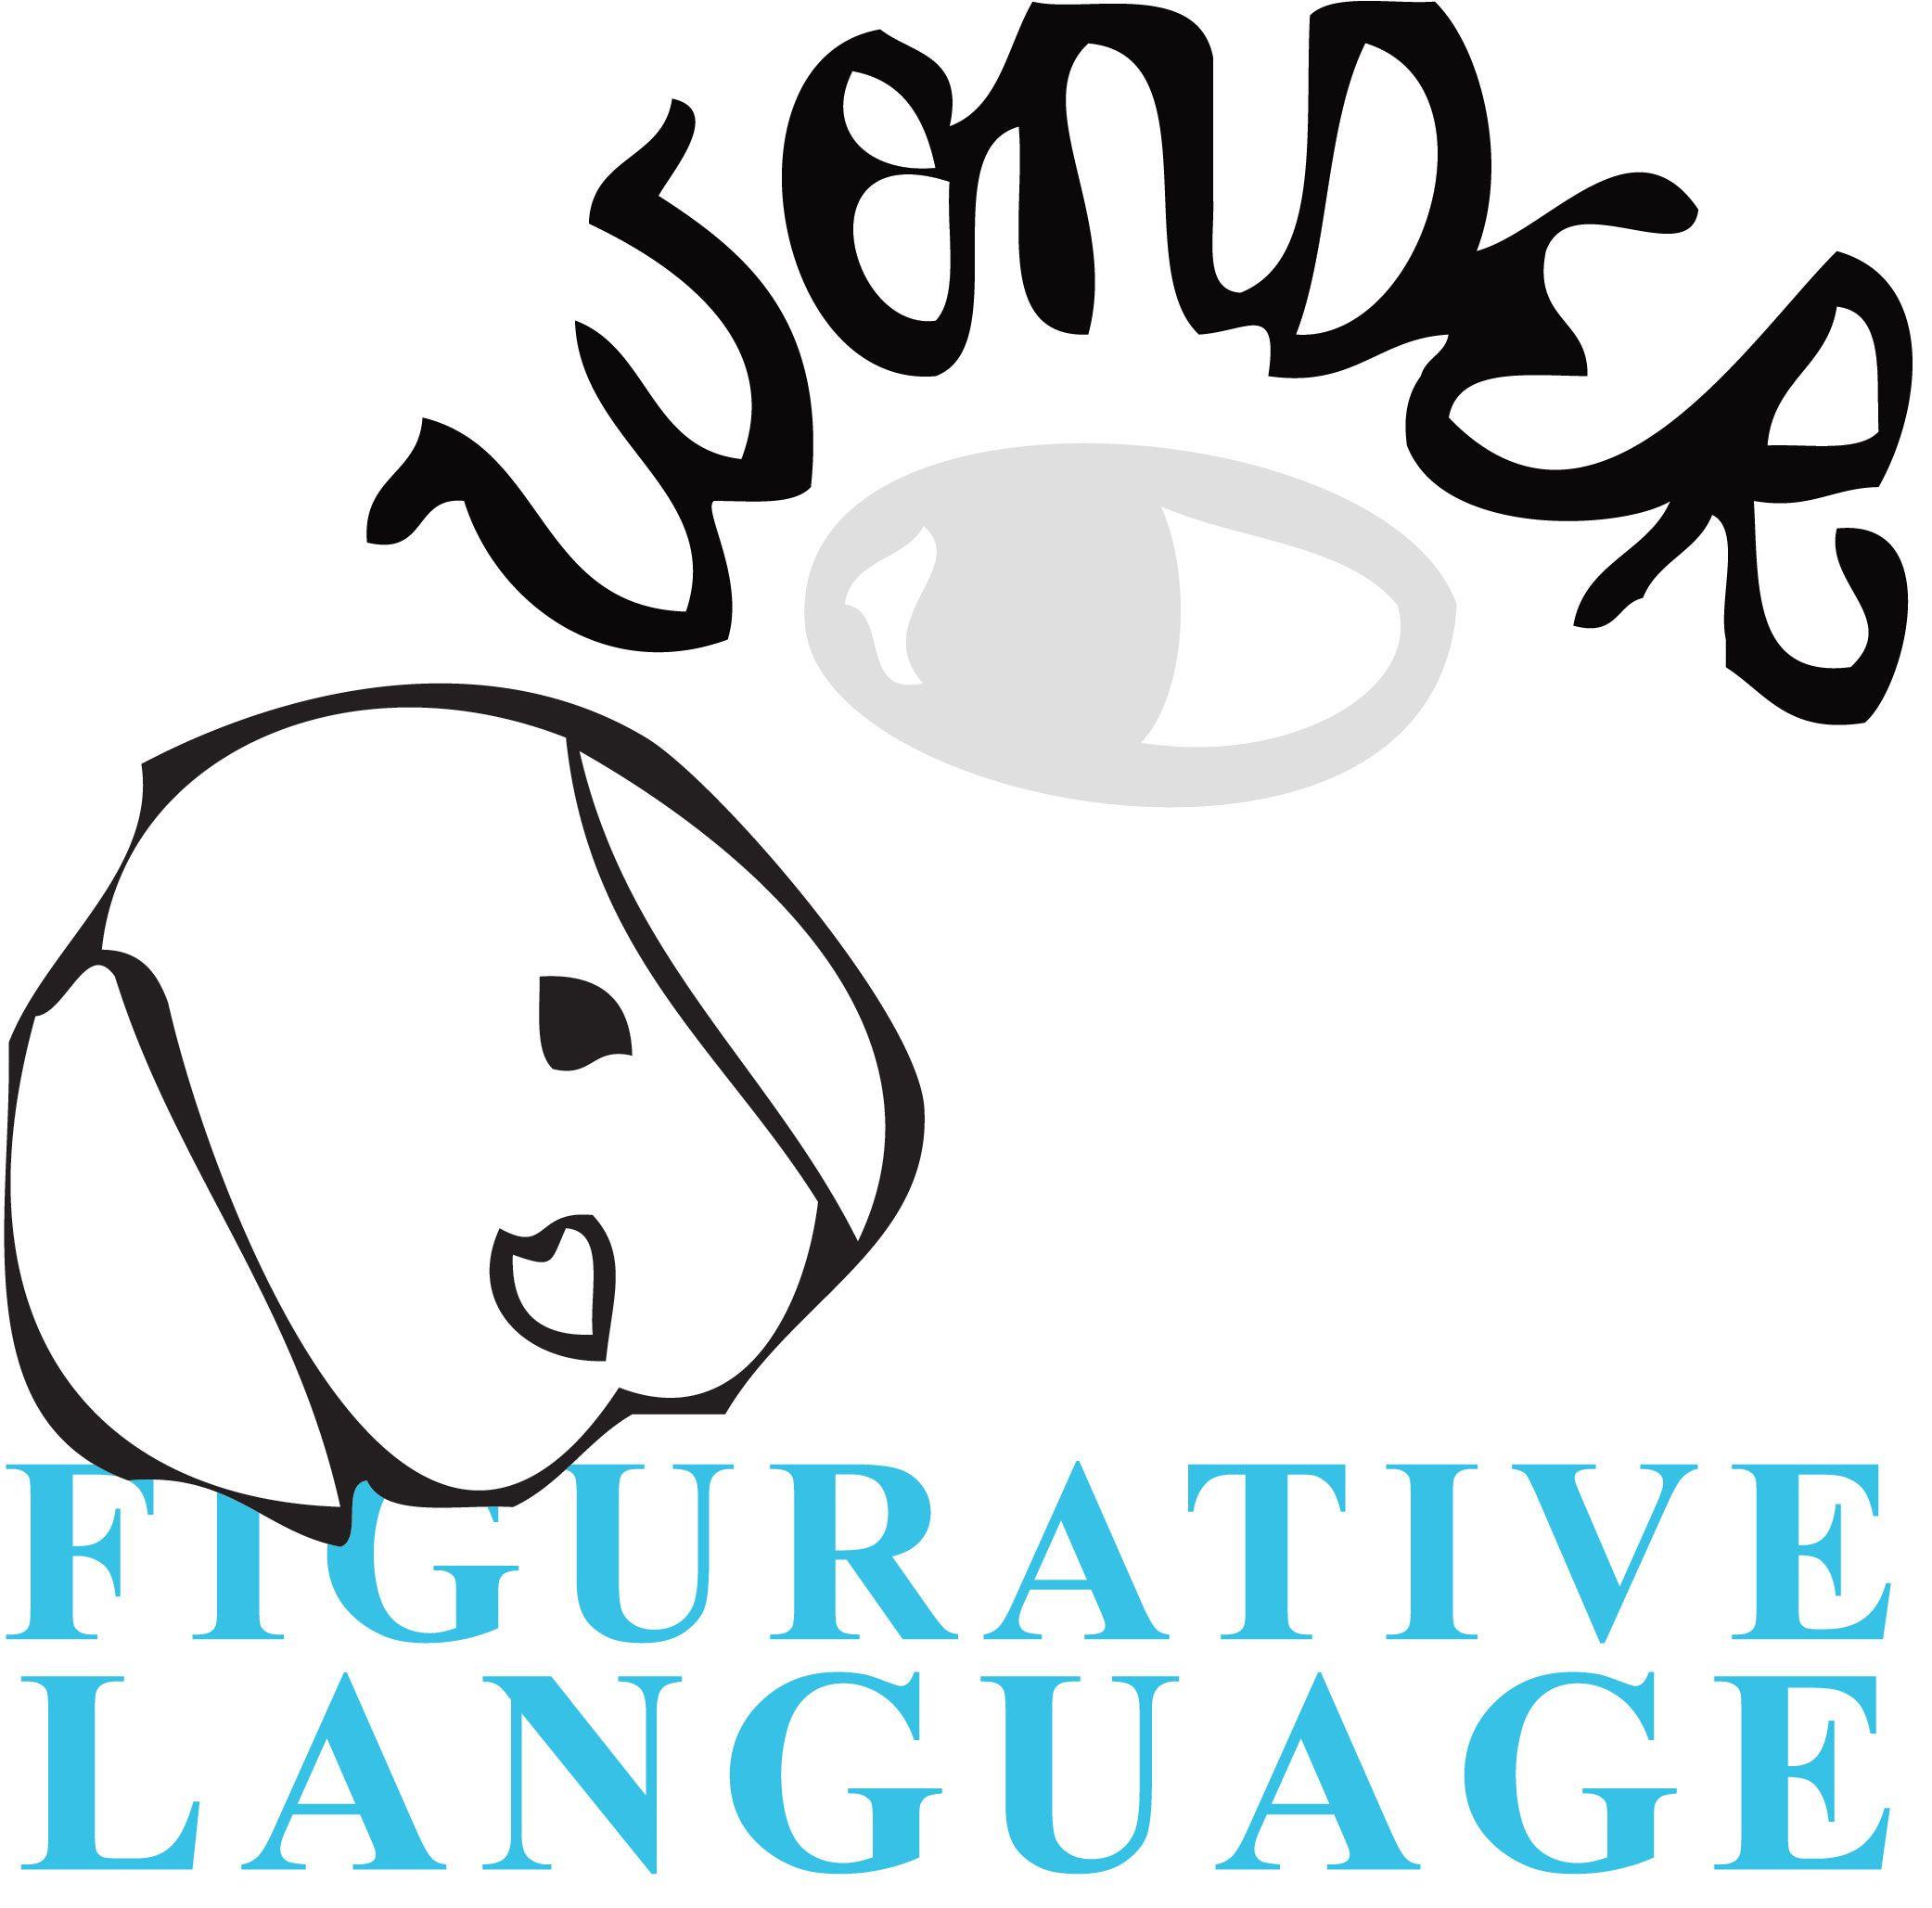 Wonder Figurative Languageyzer